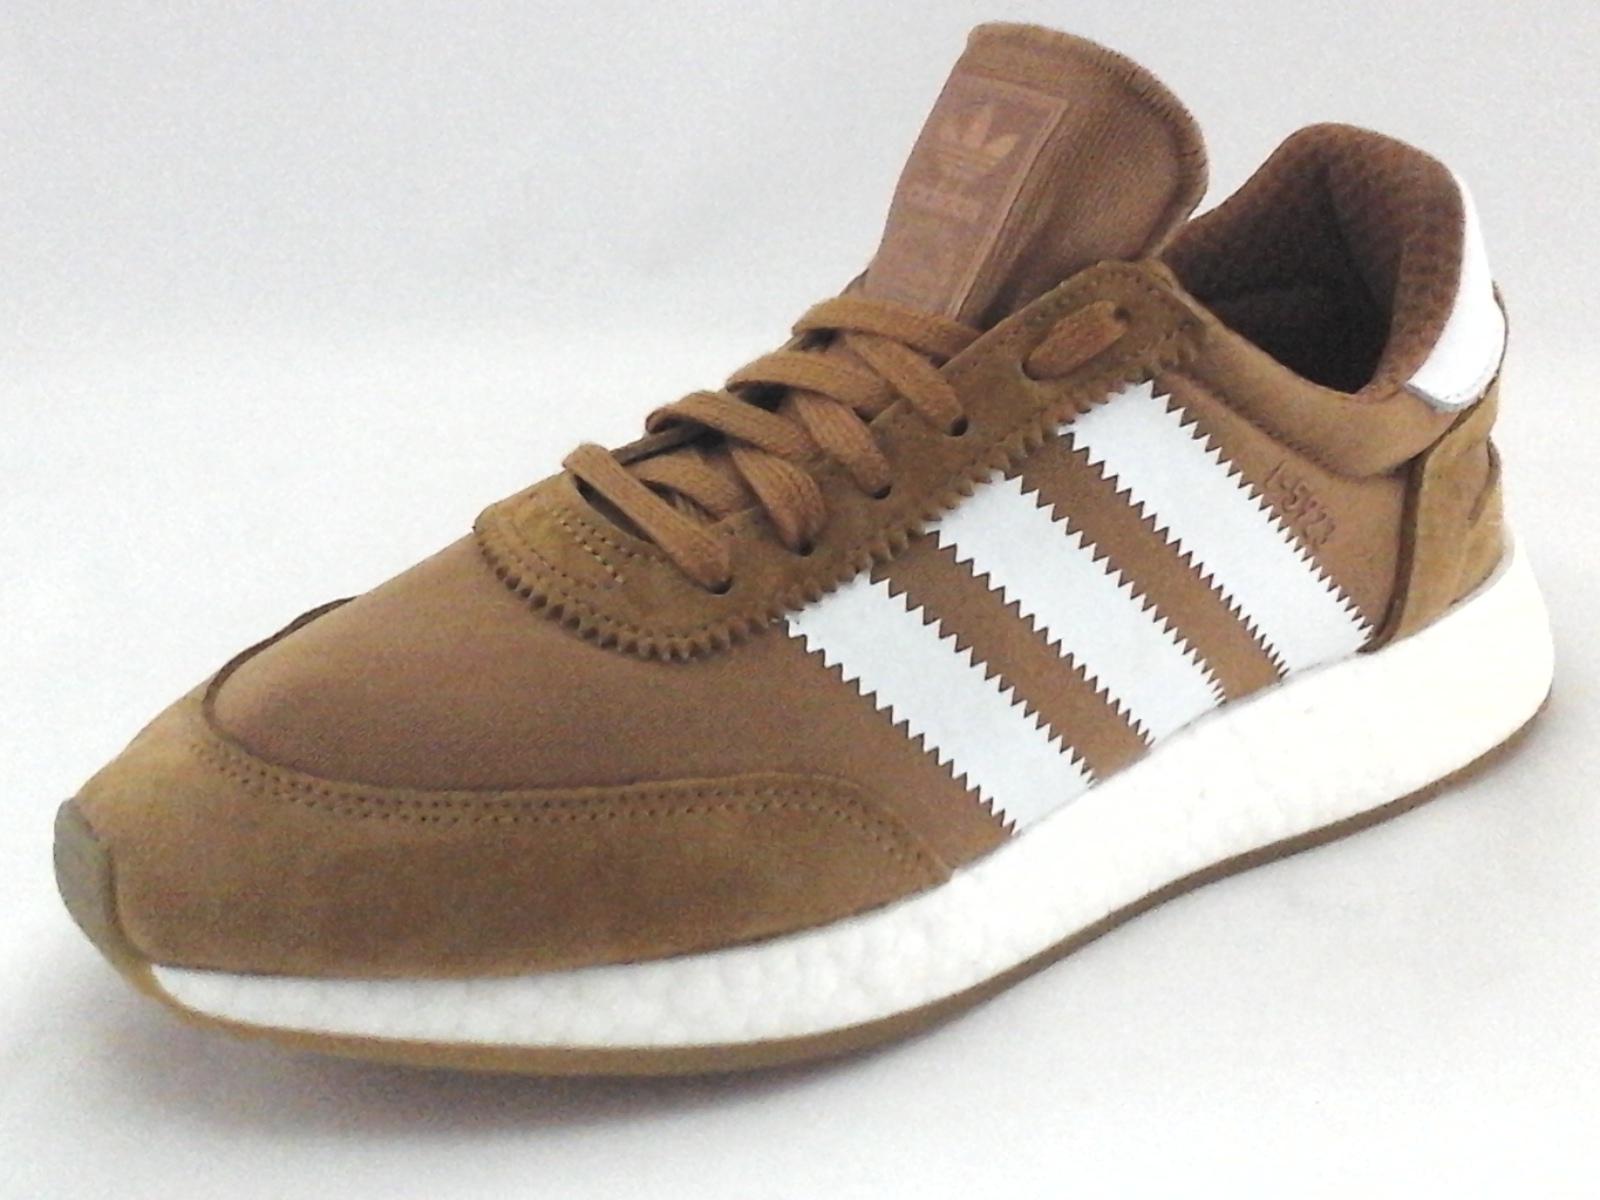 ADIDAS Boost CQ2491 Running Sneakers I5923 Mustard/White Mens US 9 ...